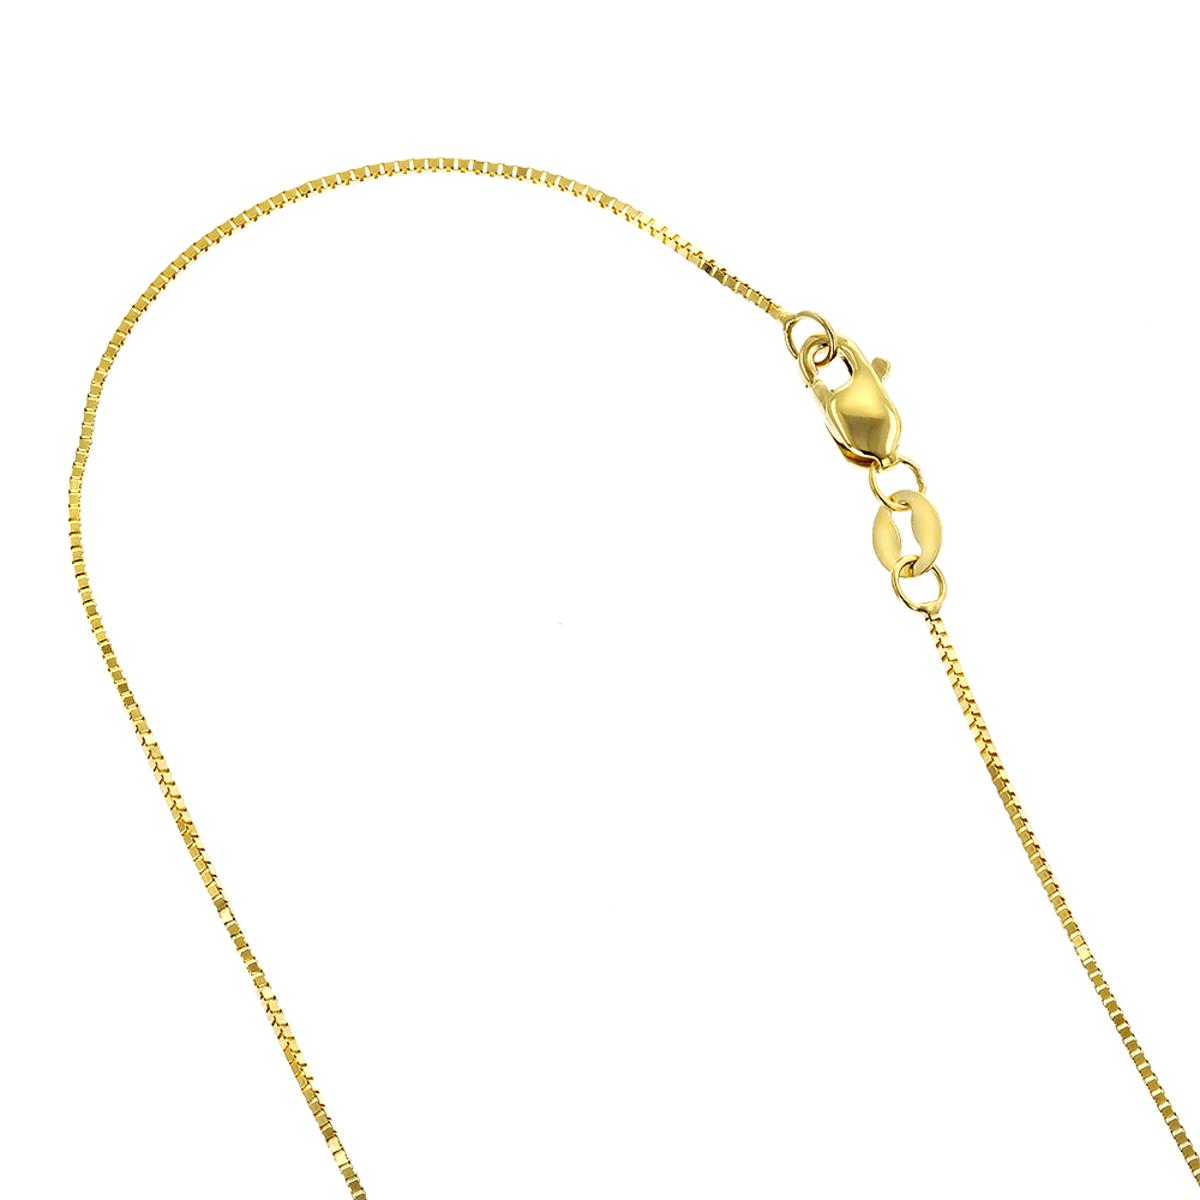 LUXURMAN Solid 14k Gold Box Chain For Women 0.5mm Wide